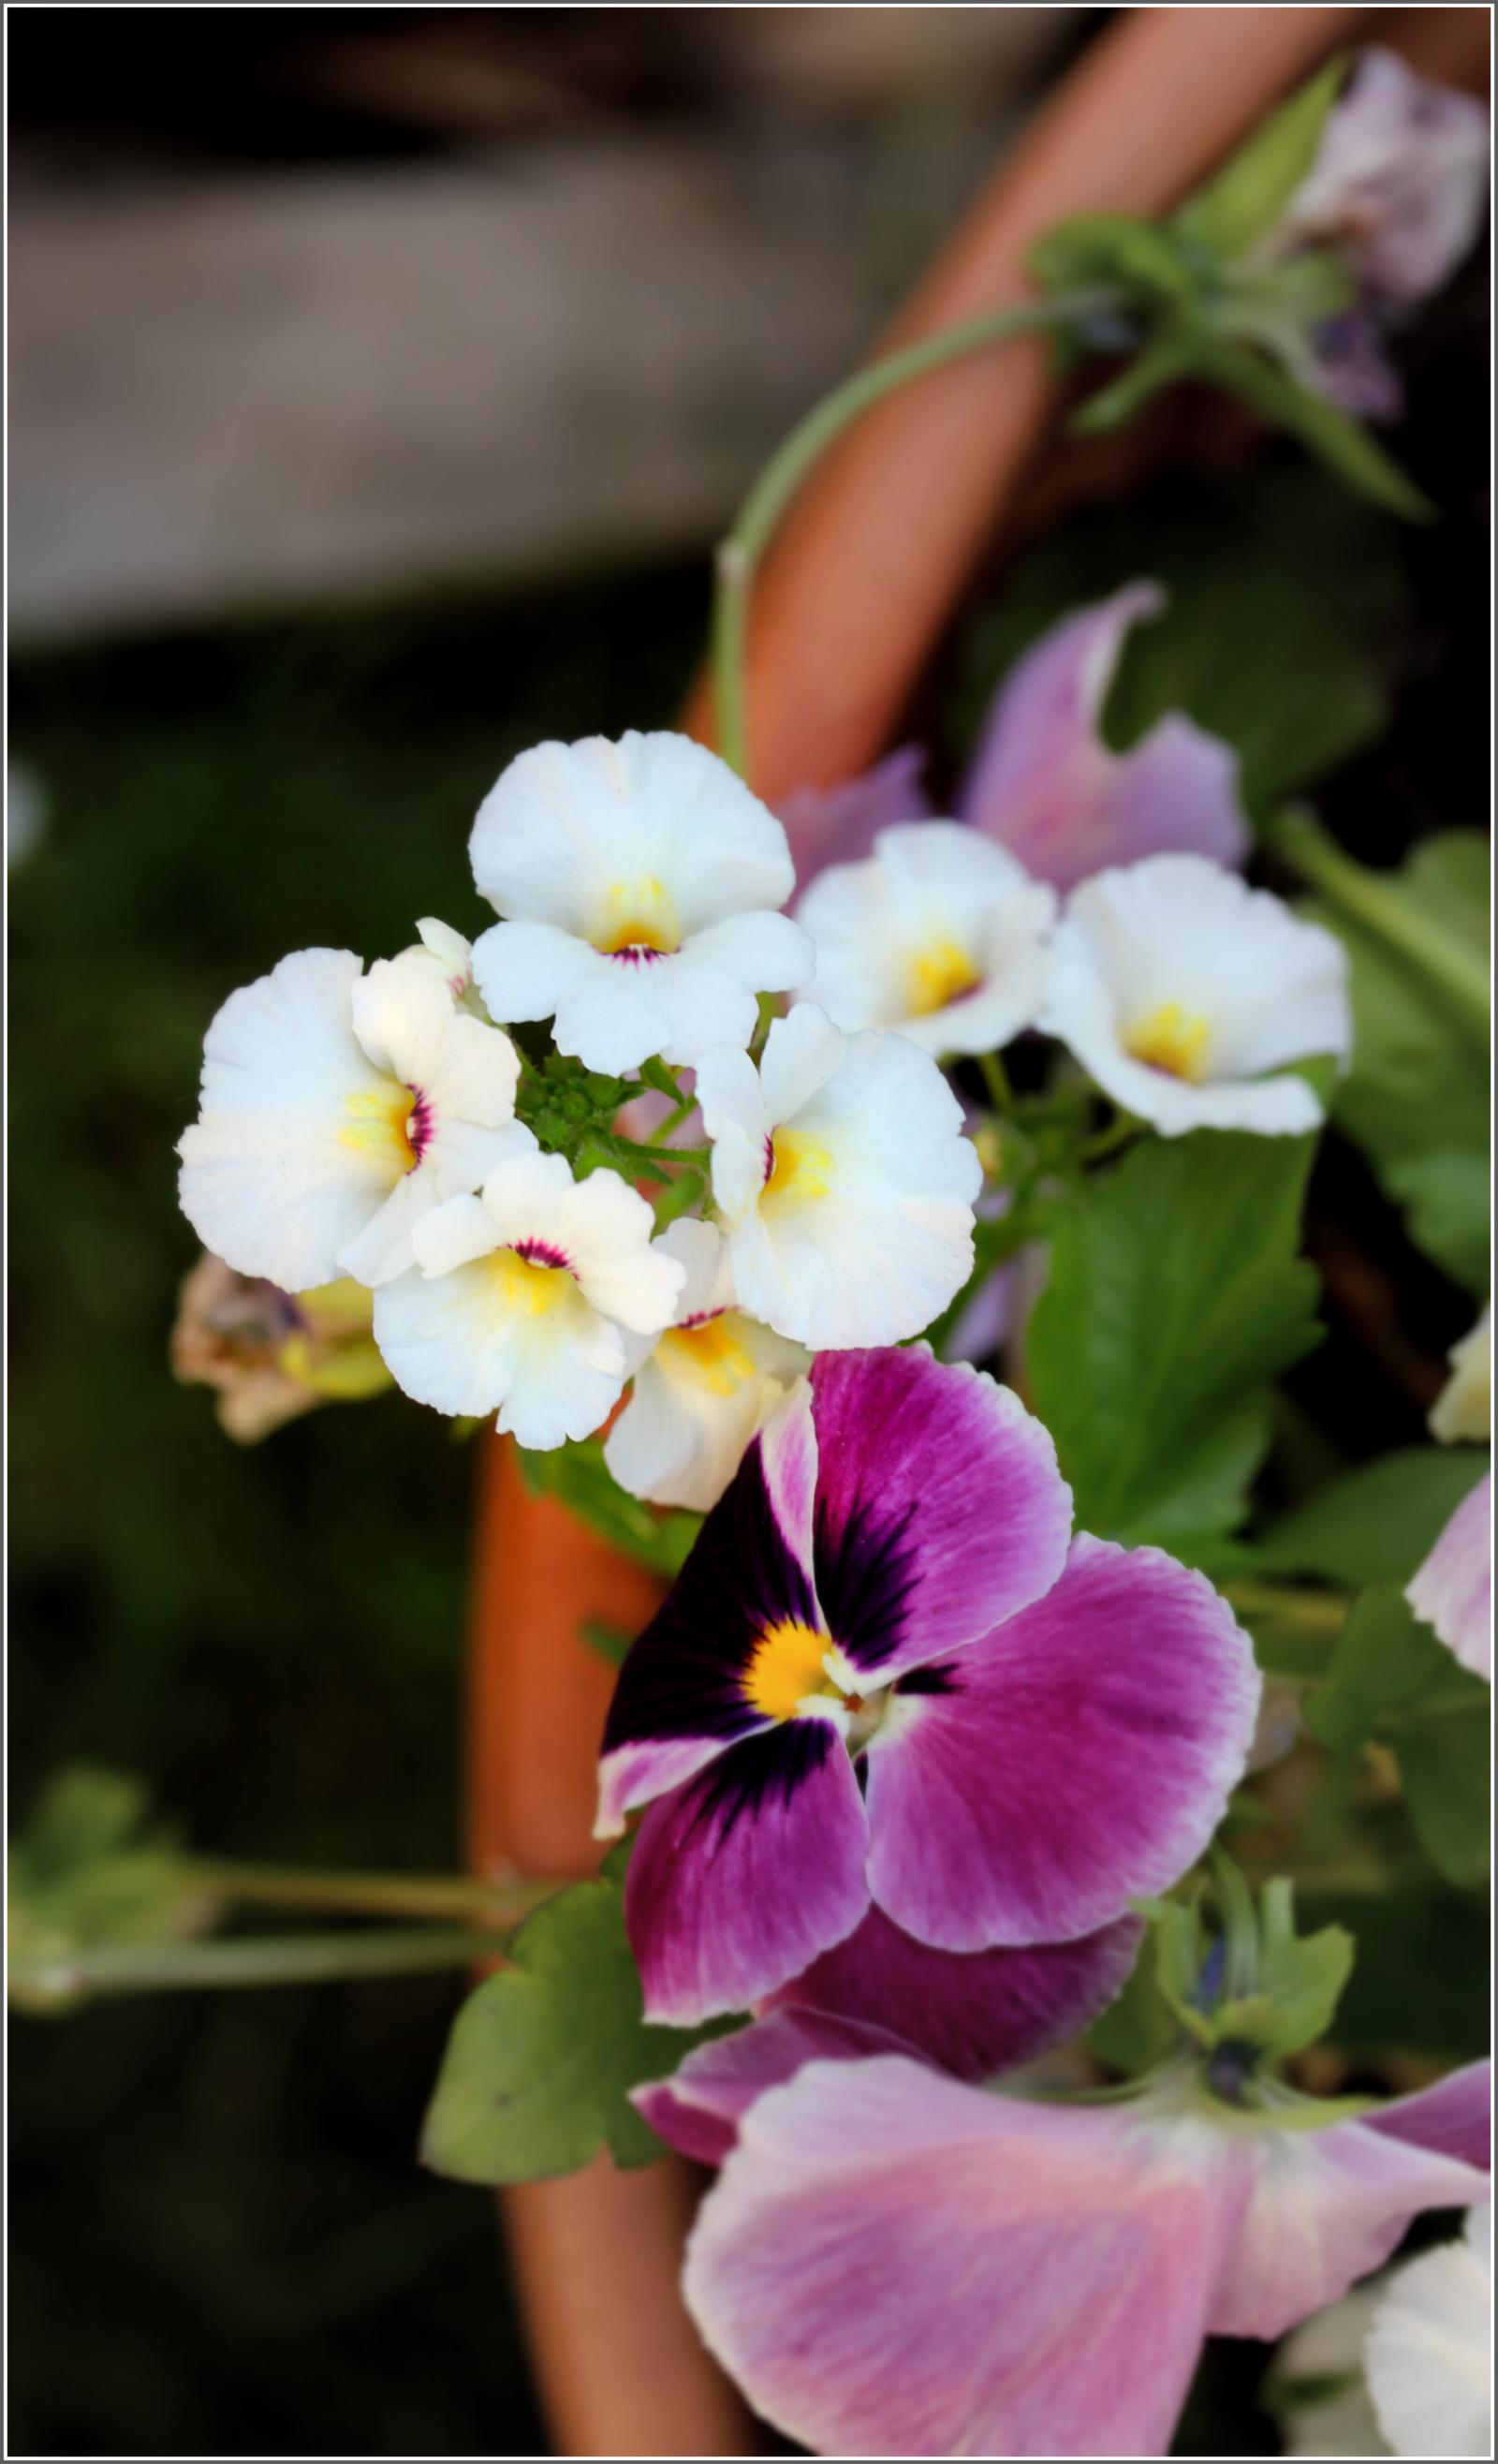 White Flowers in Basket by Dena T Bray©